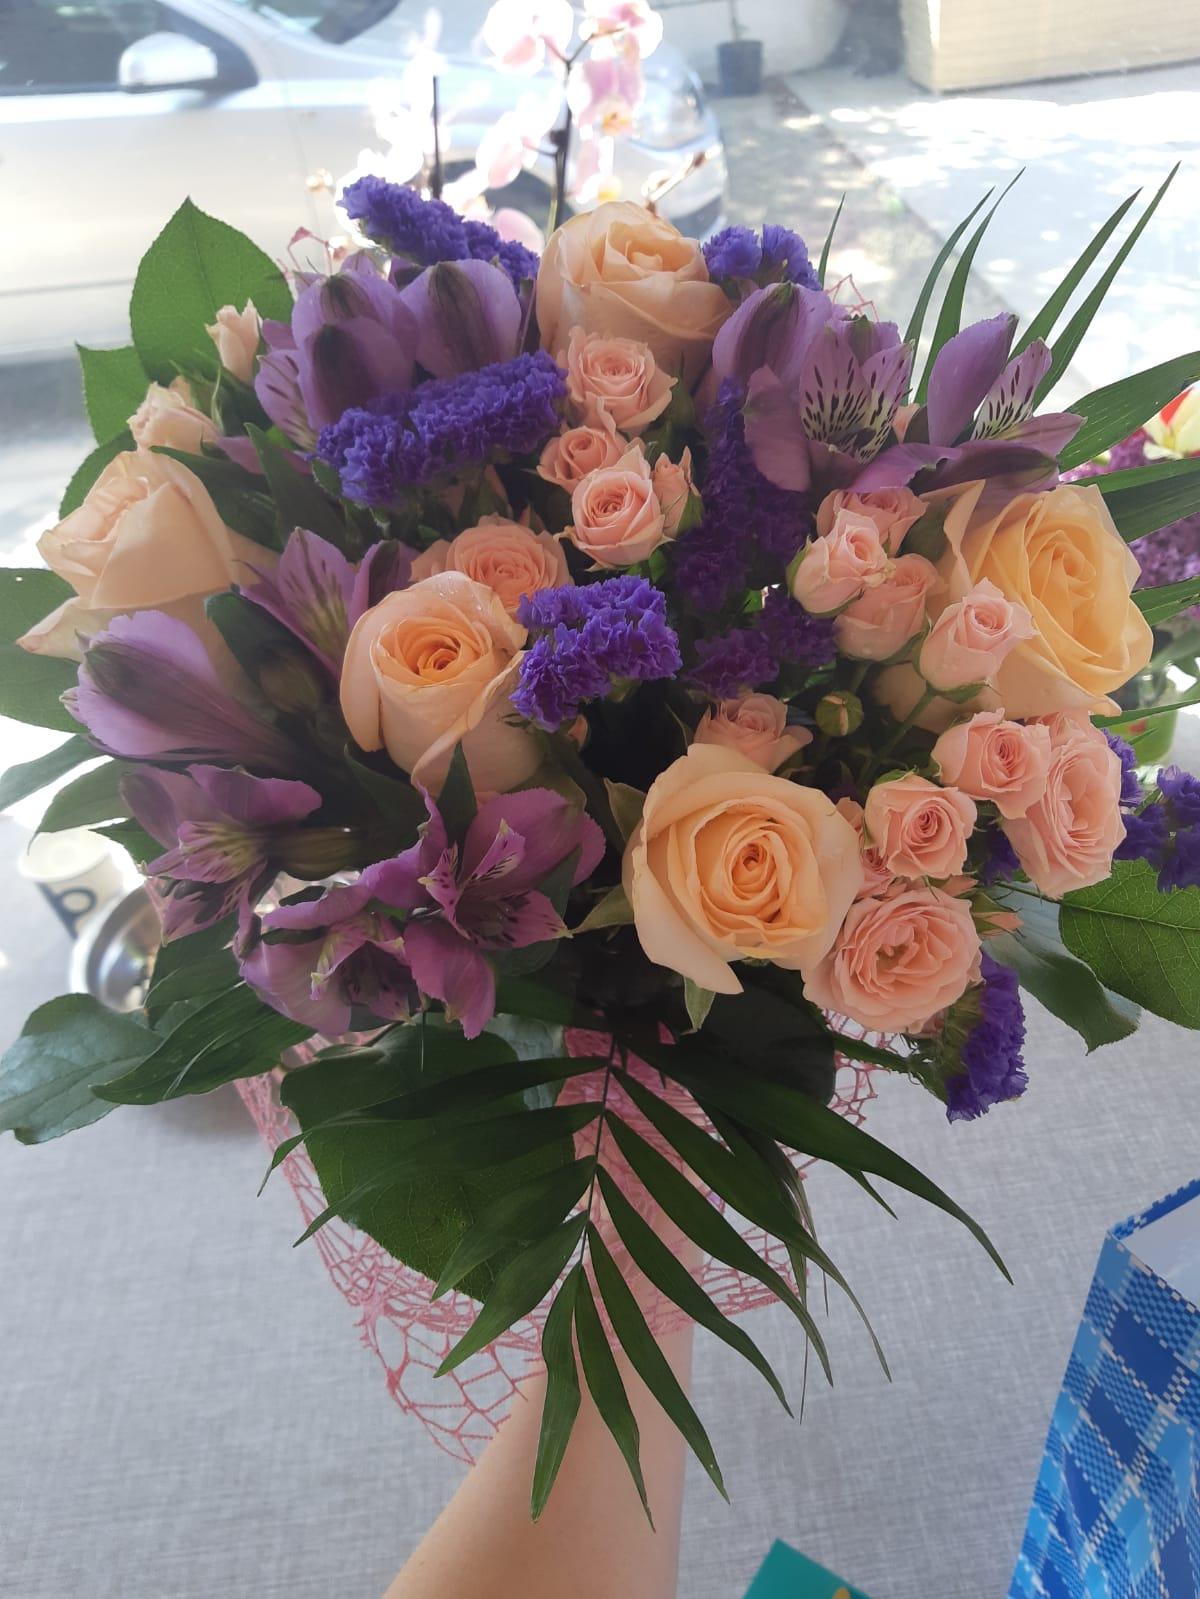 Buchet 5 trandafiri somon, 3 astromeria mov, 3 minirose roz, limonium preț 100 lei